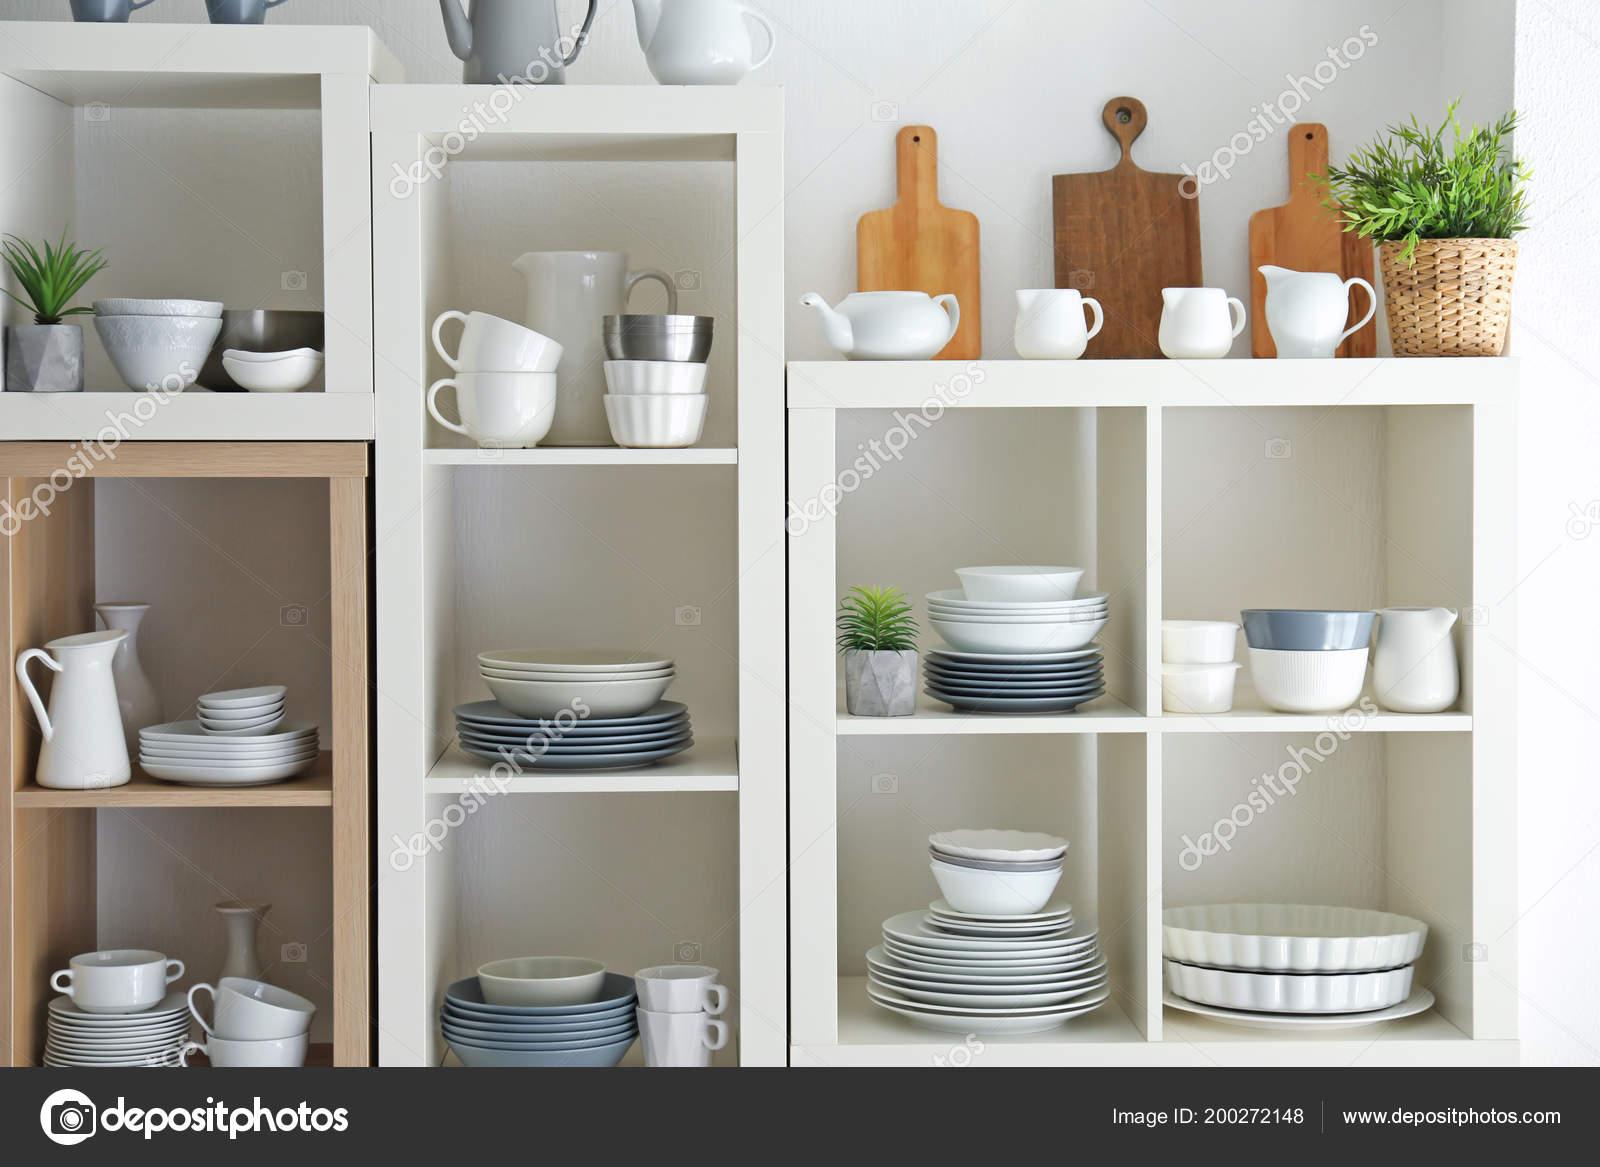 Strange Kitchen Shelving Dishes White Wall Background Stock Photo Download Free Architecture Designs Rallybritishbridgeorg